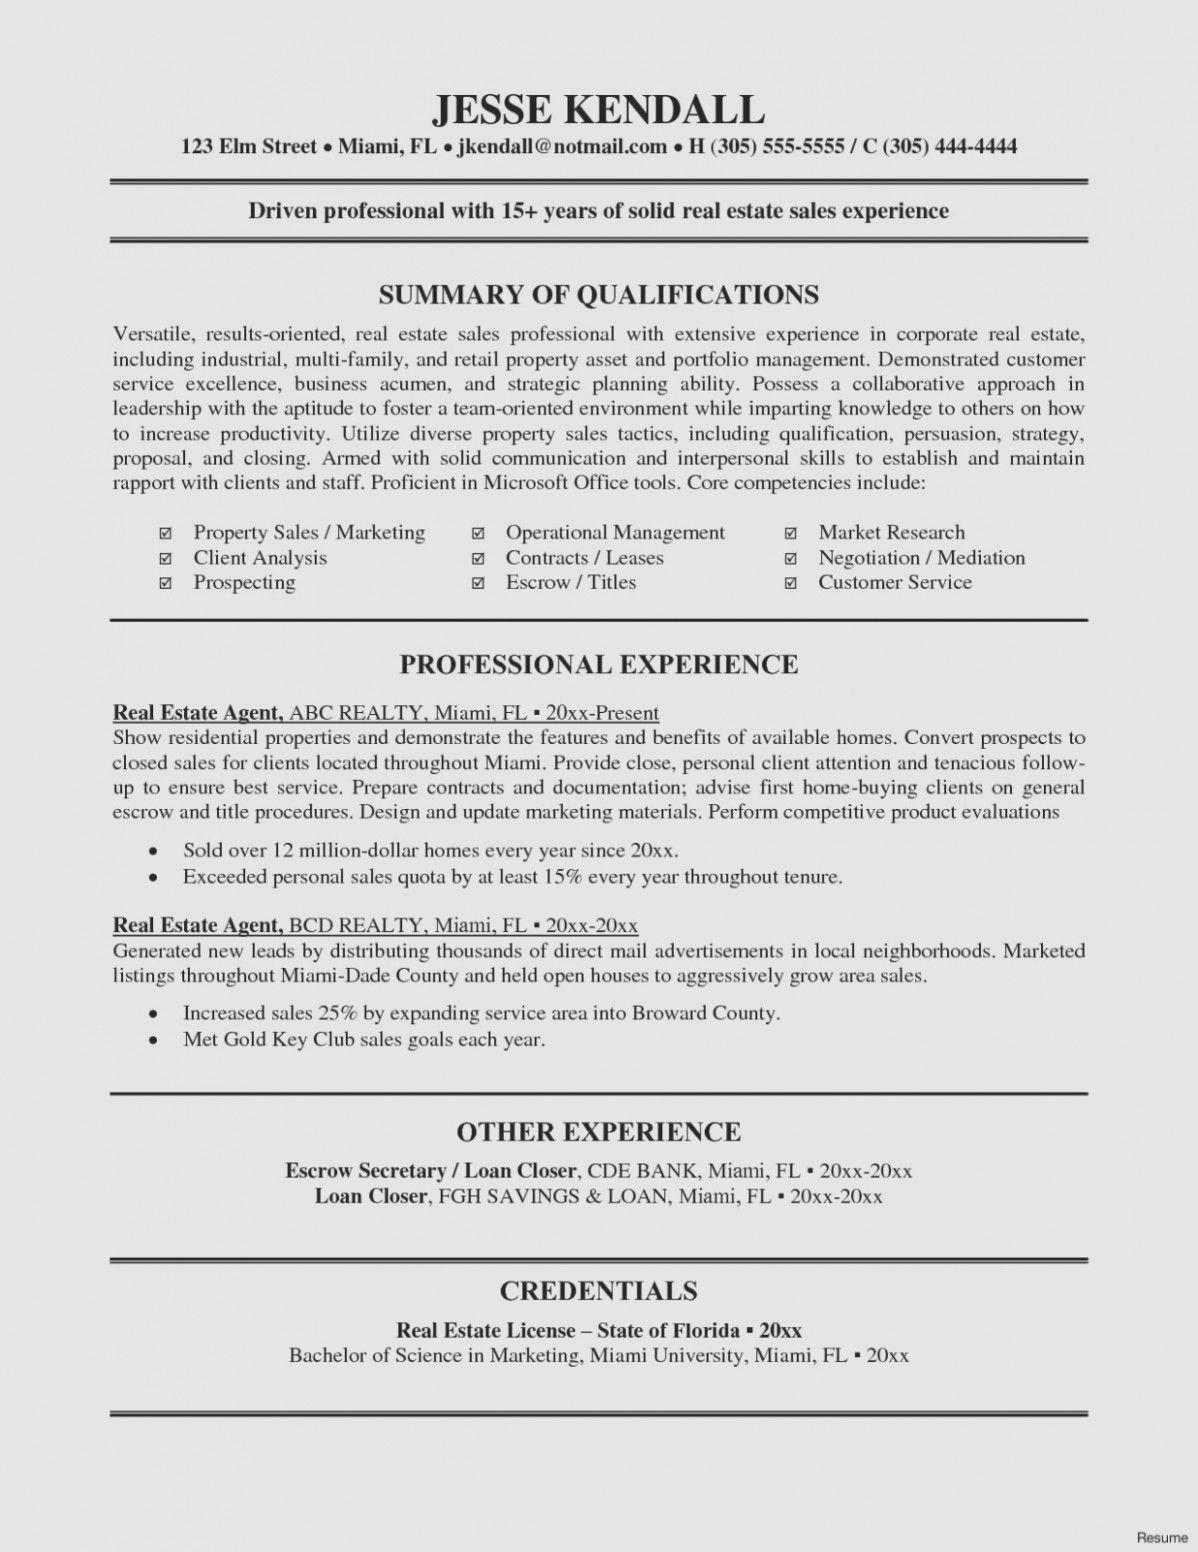 Real estate agent job description for resume interesting